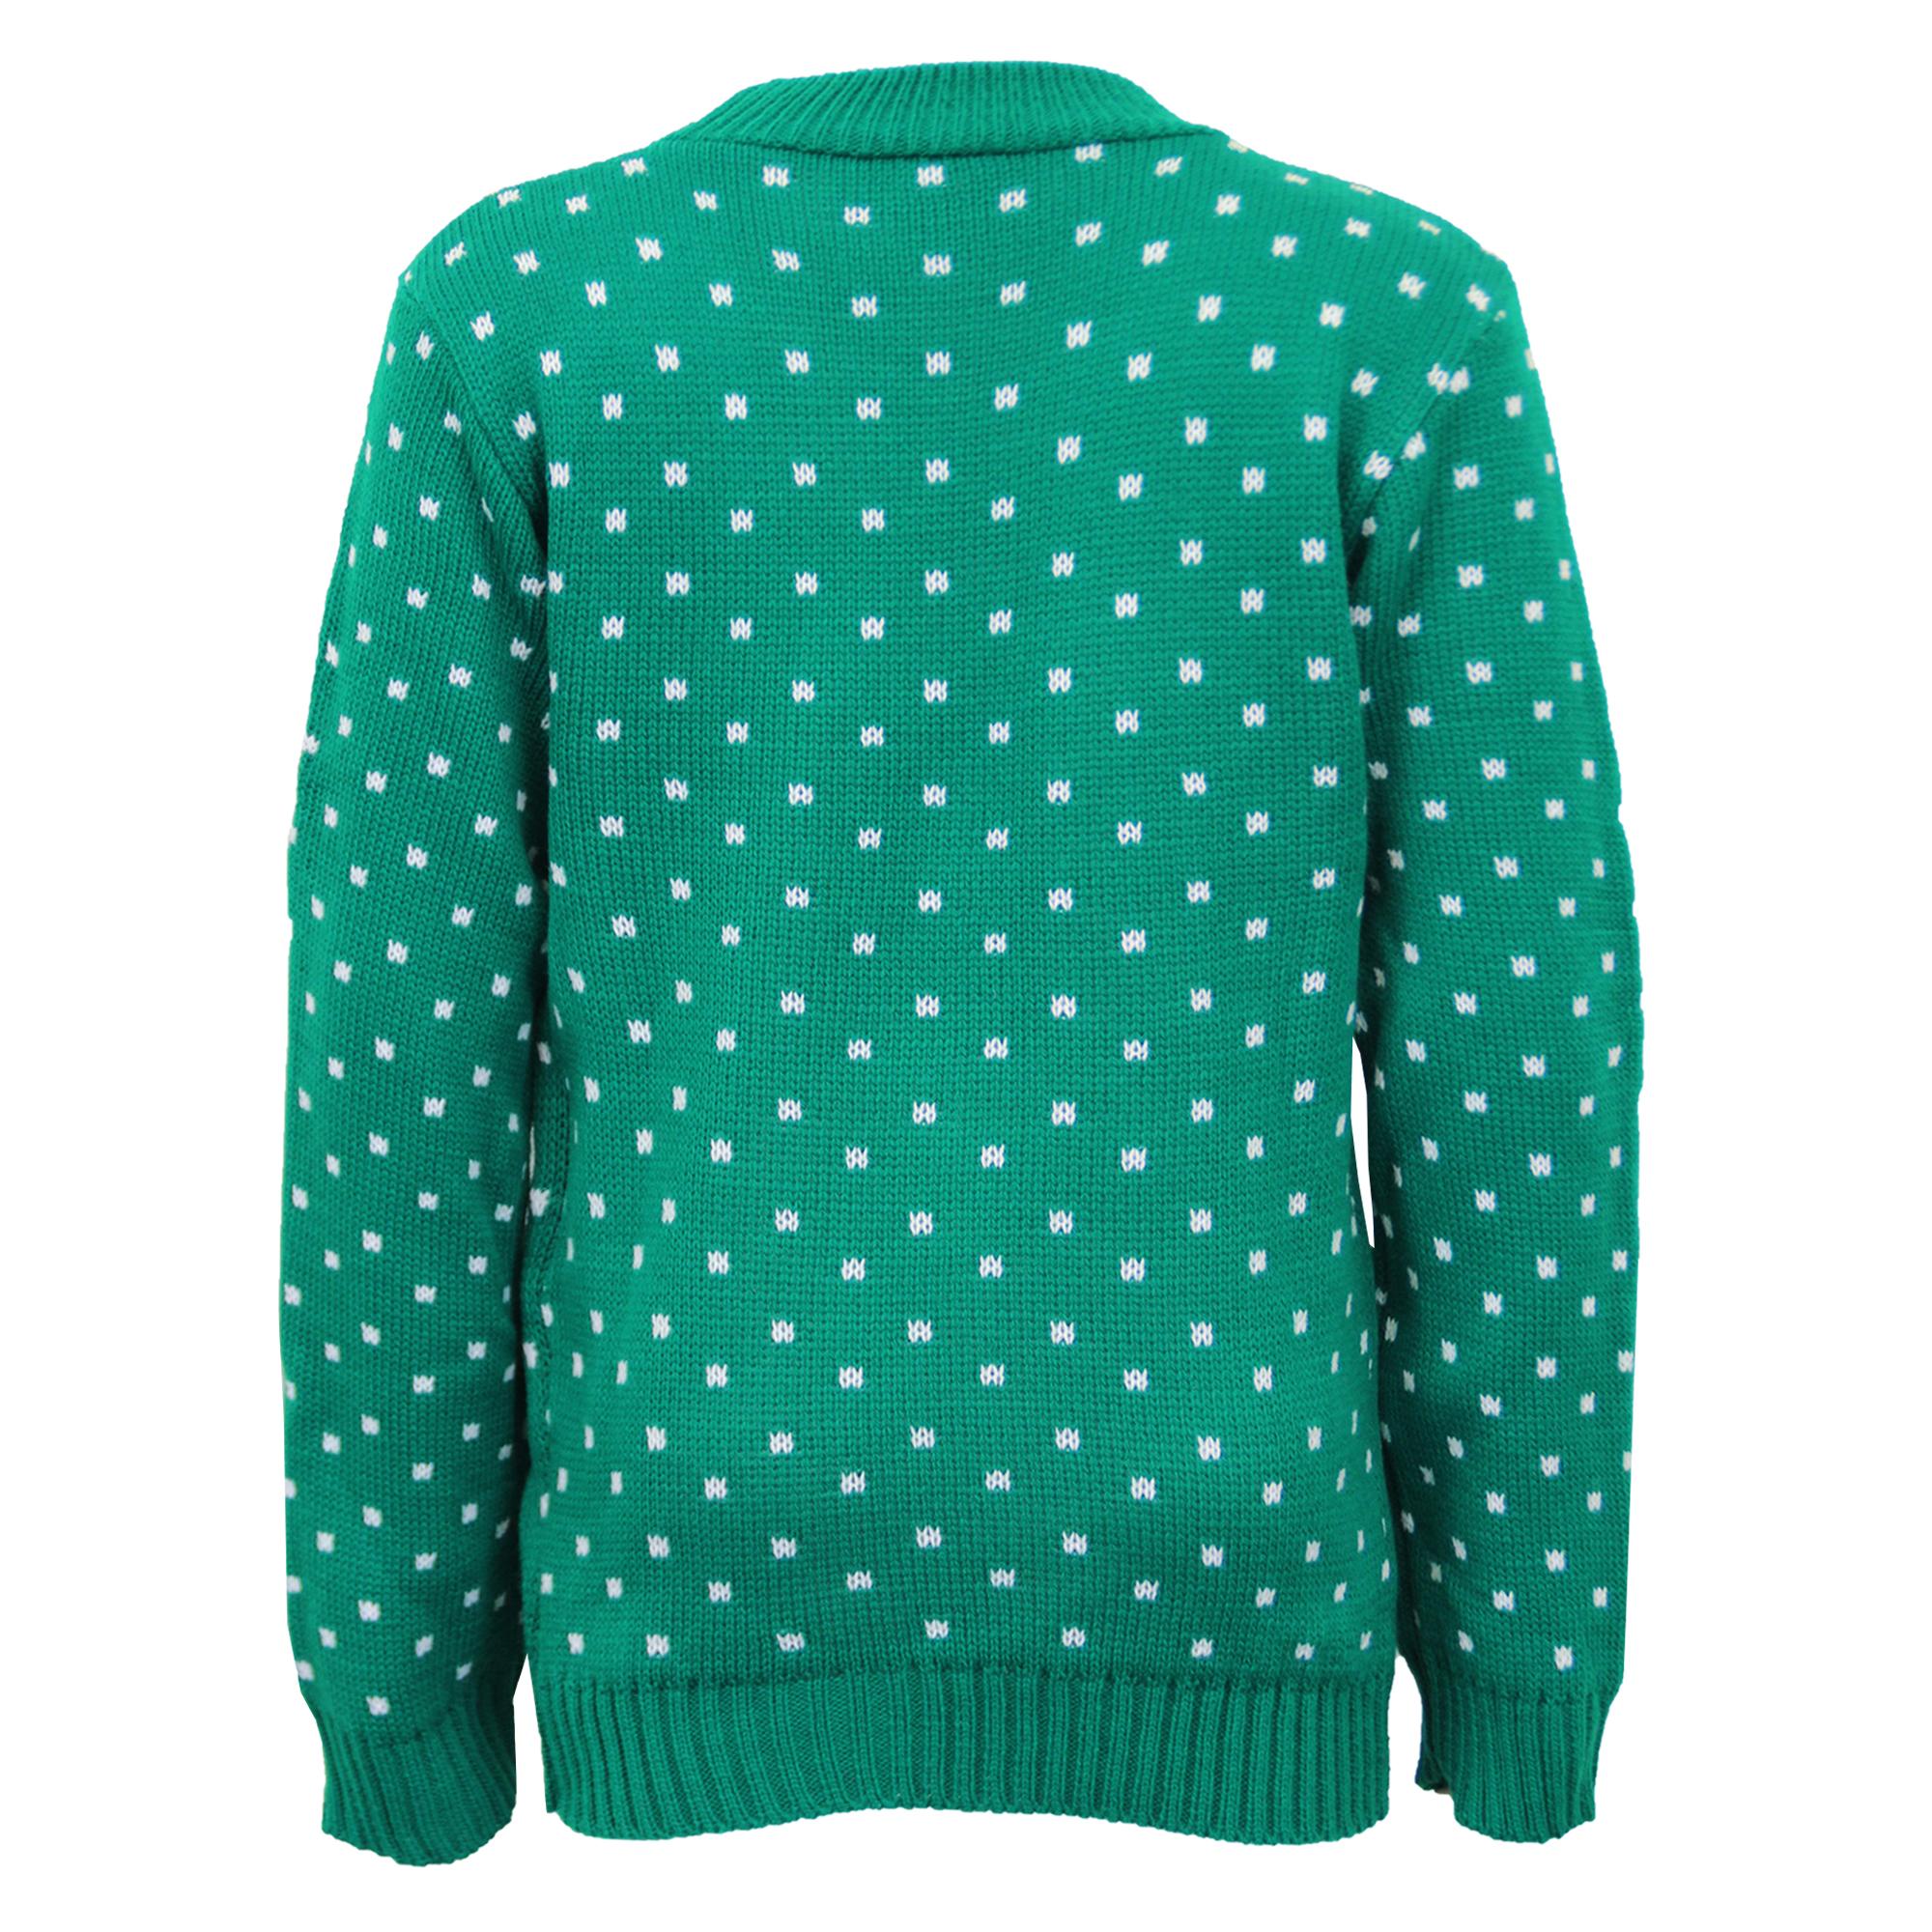 Boys-Christmas-Girls-Jumper-XMAS-Kids-Rudolph-Knitted-Pom-3D-Novelty-Winter-New thumbnail 6